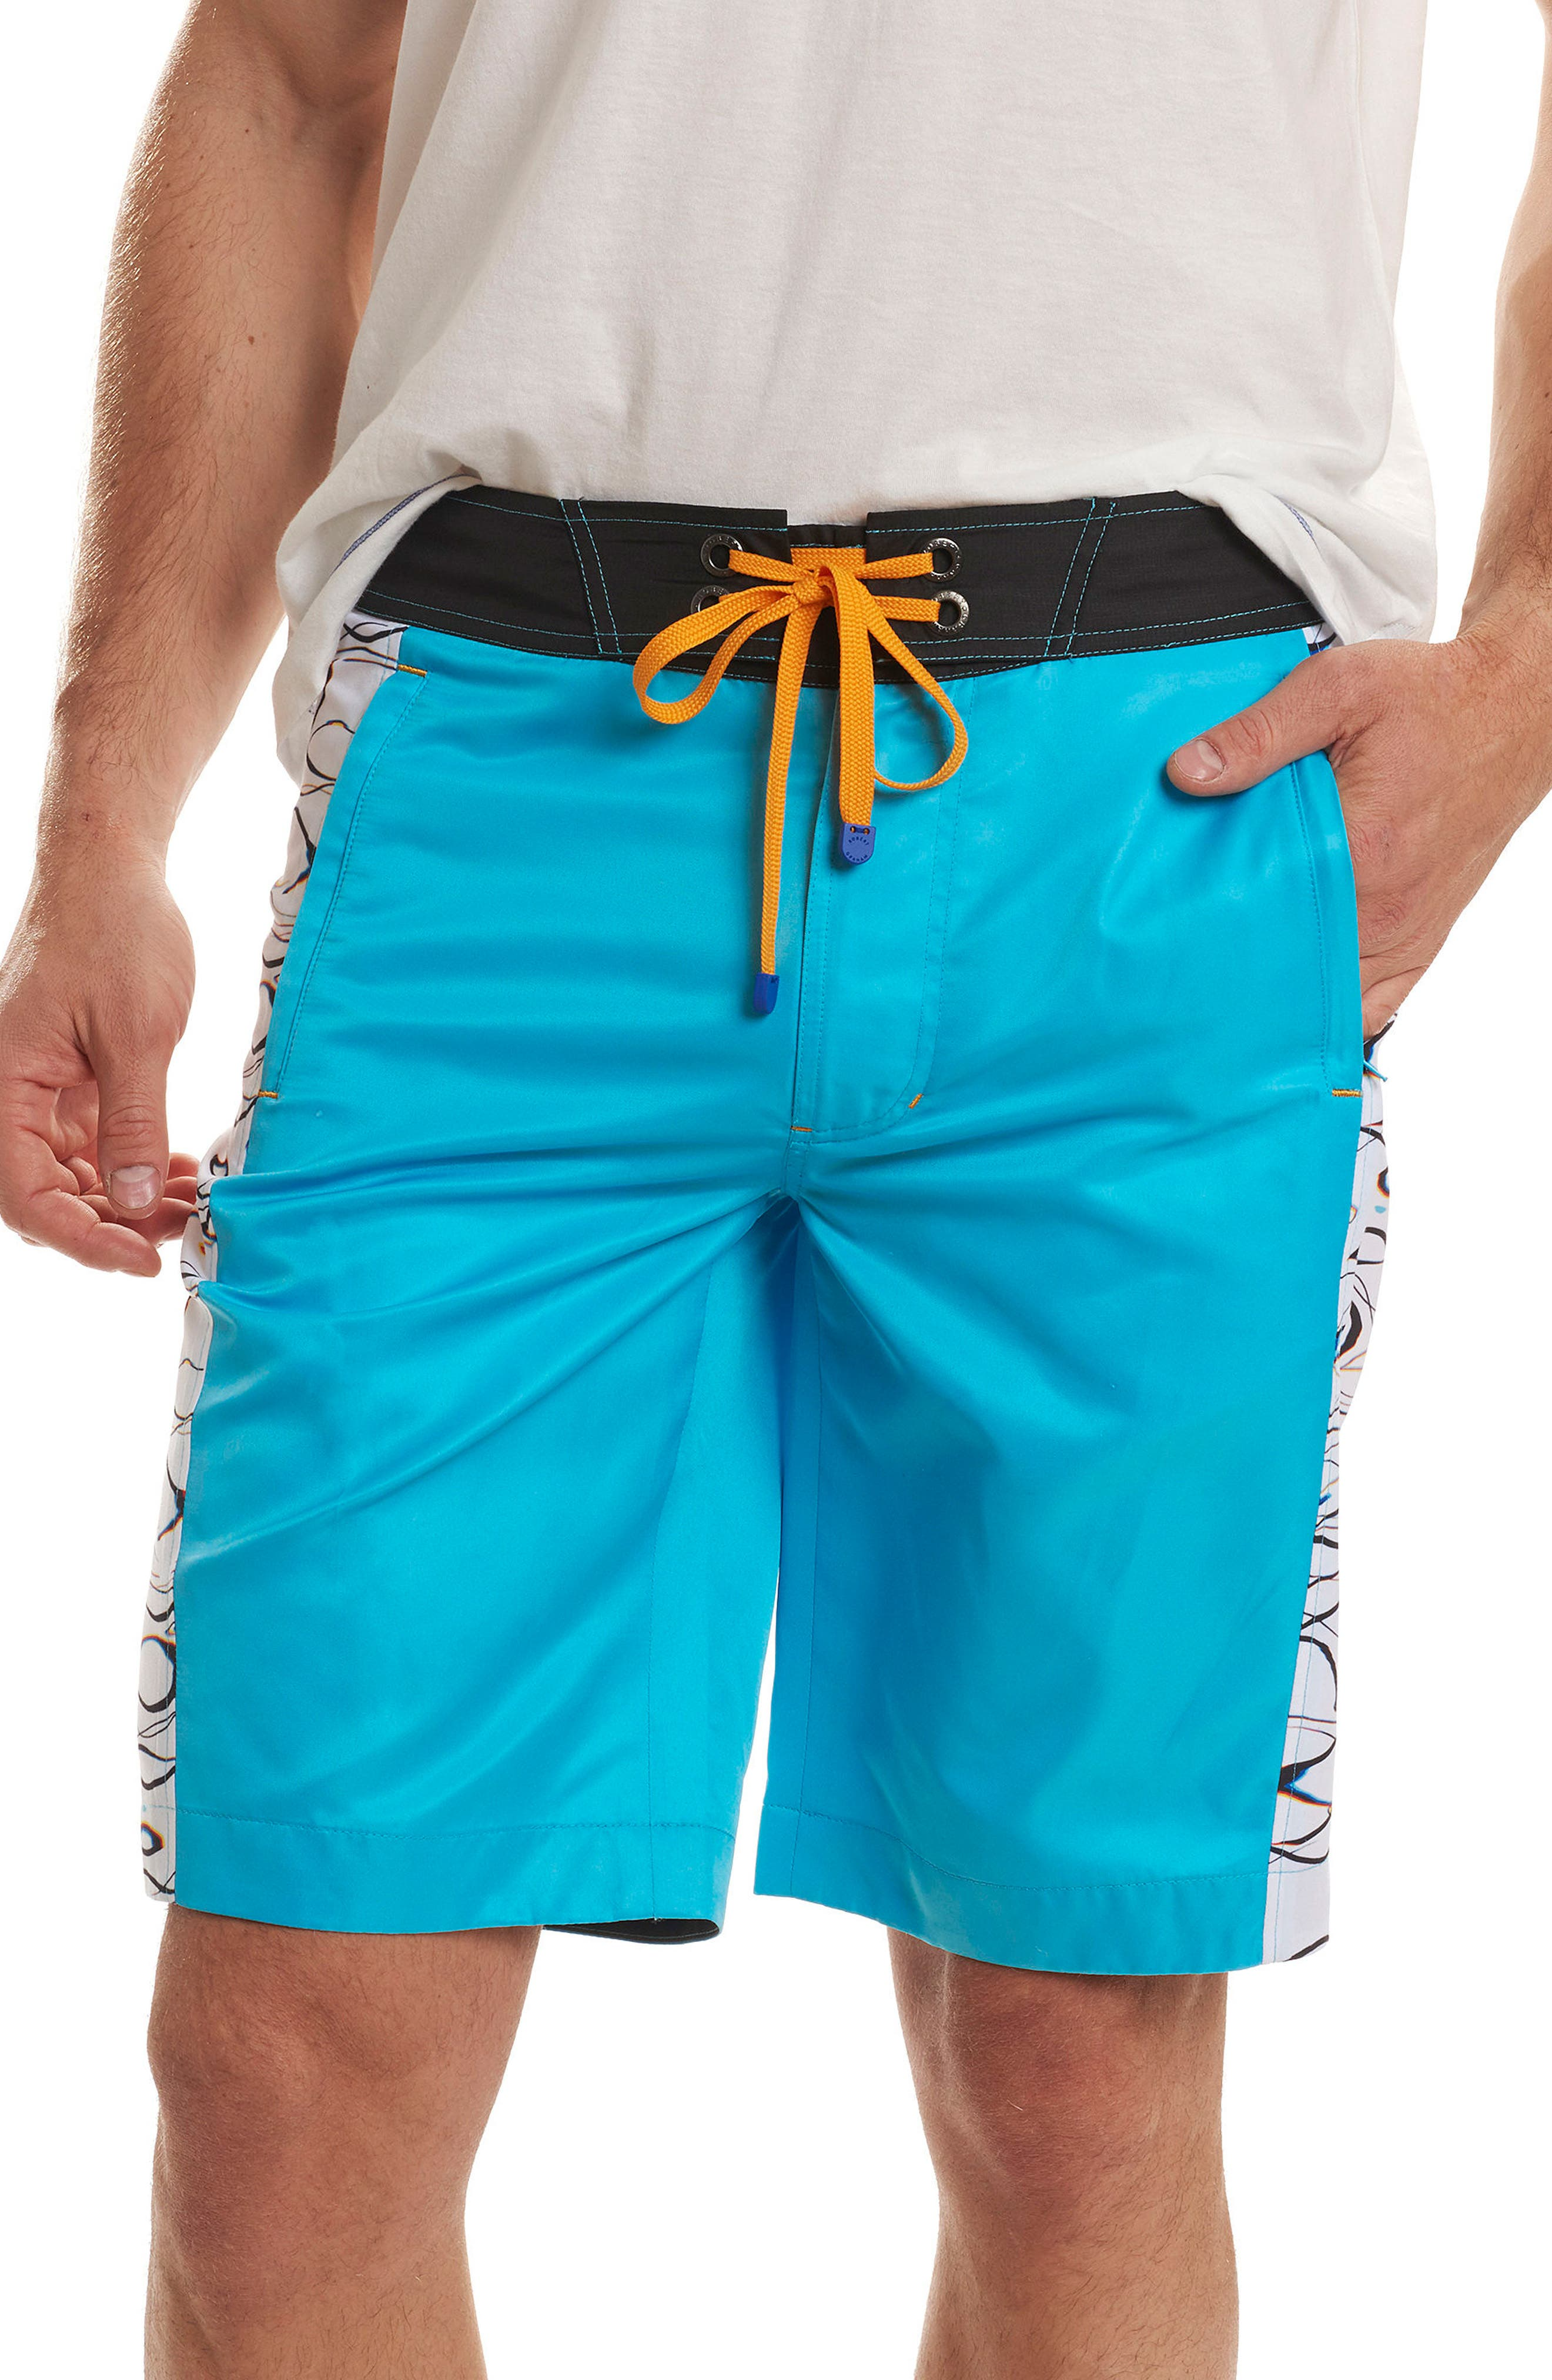 Maili Classic Fit Swim Trunks,                         Main,                         color, 459